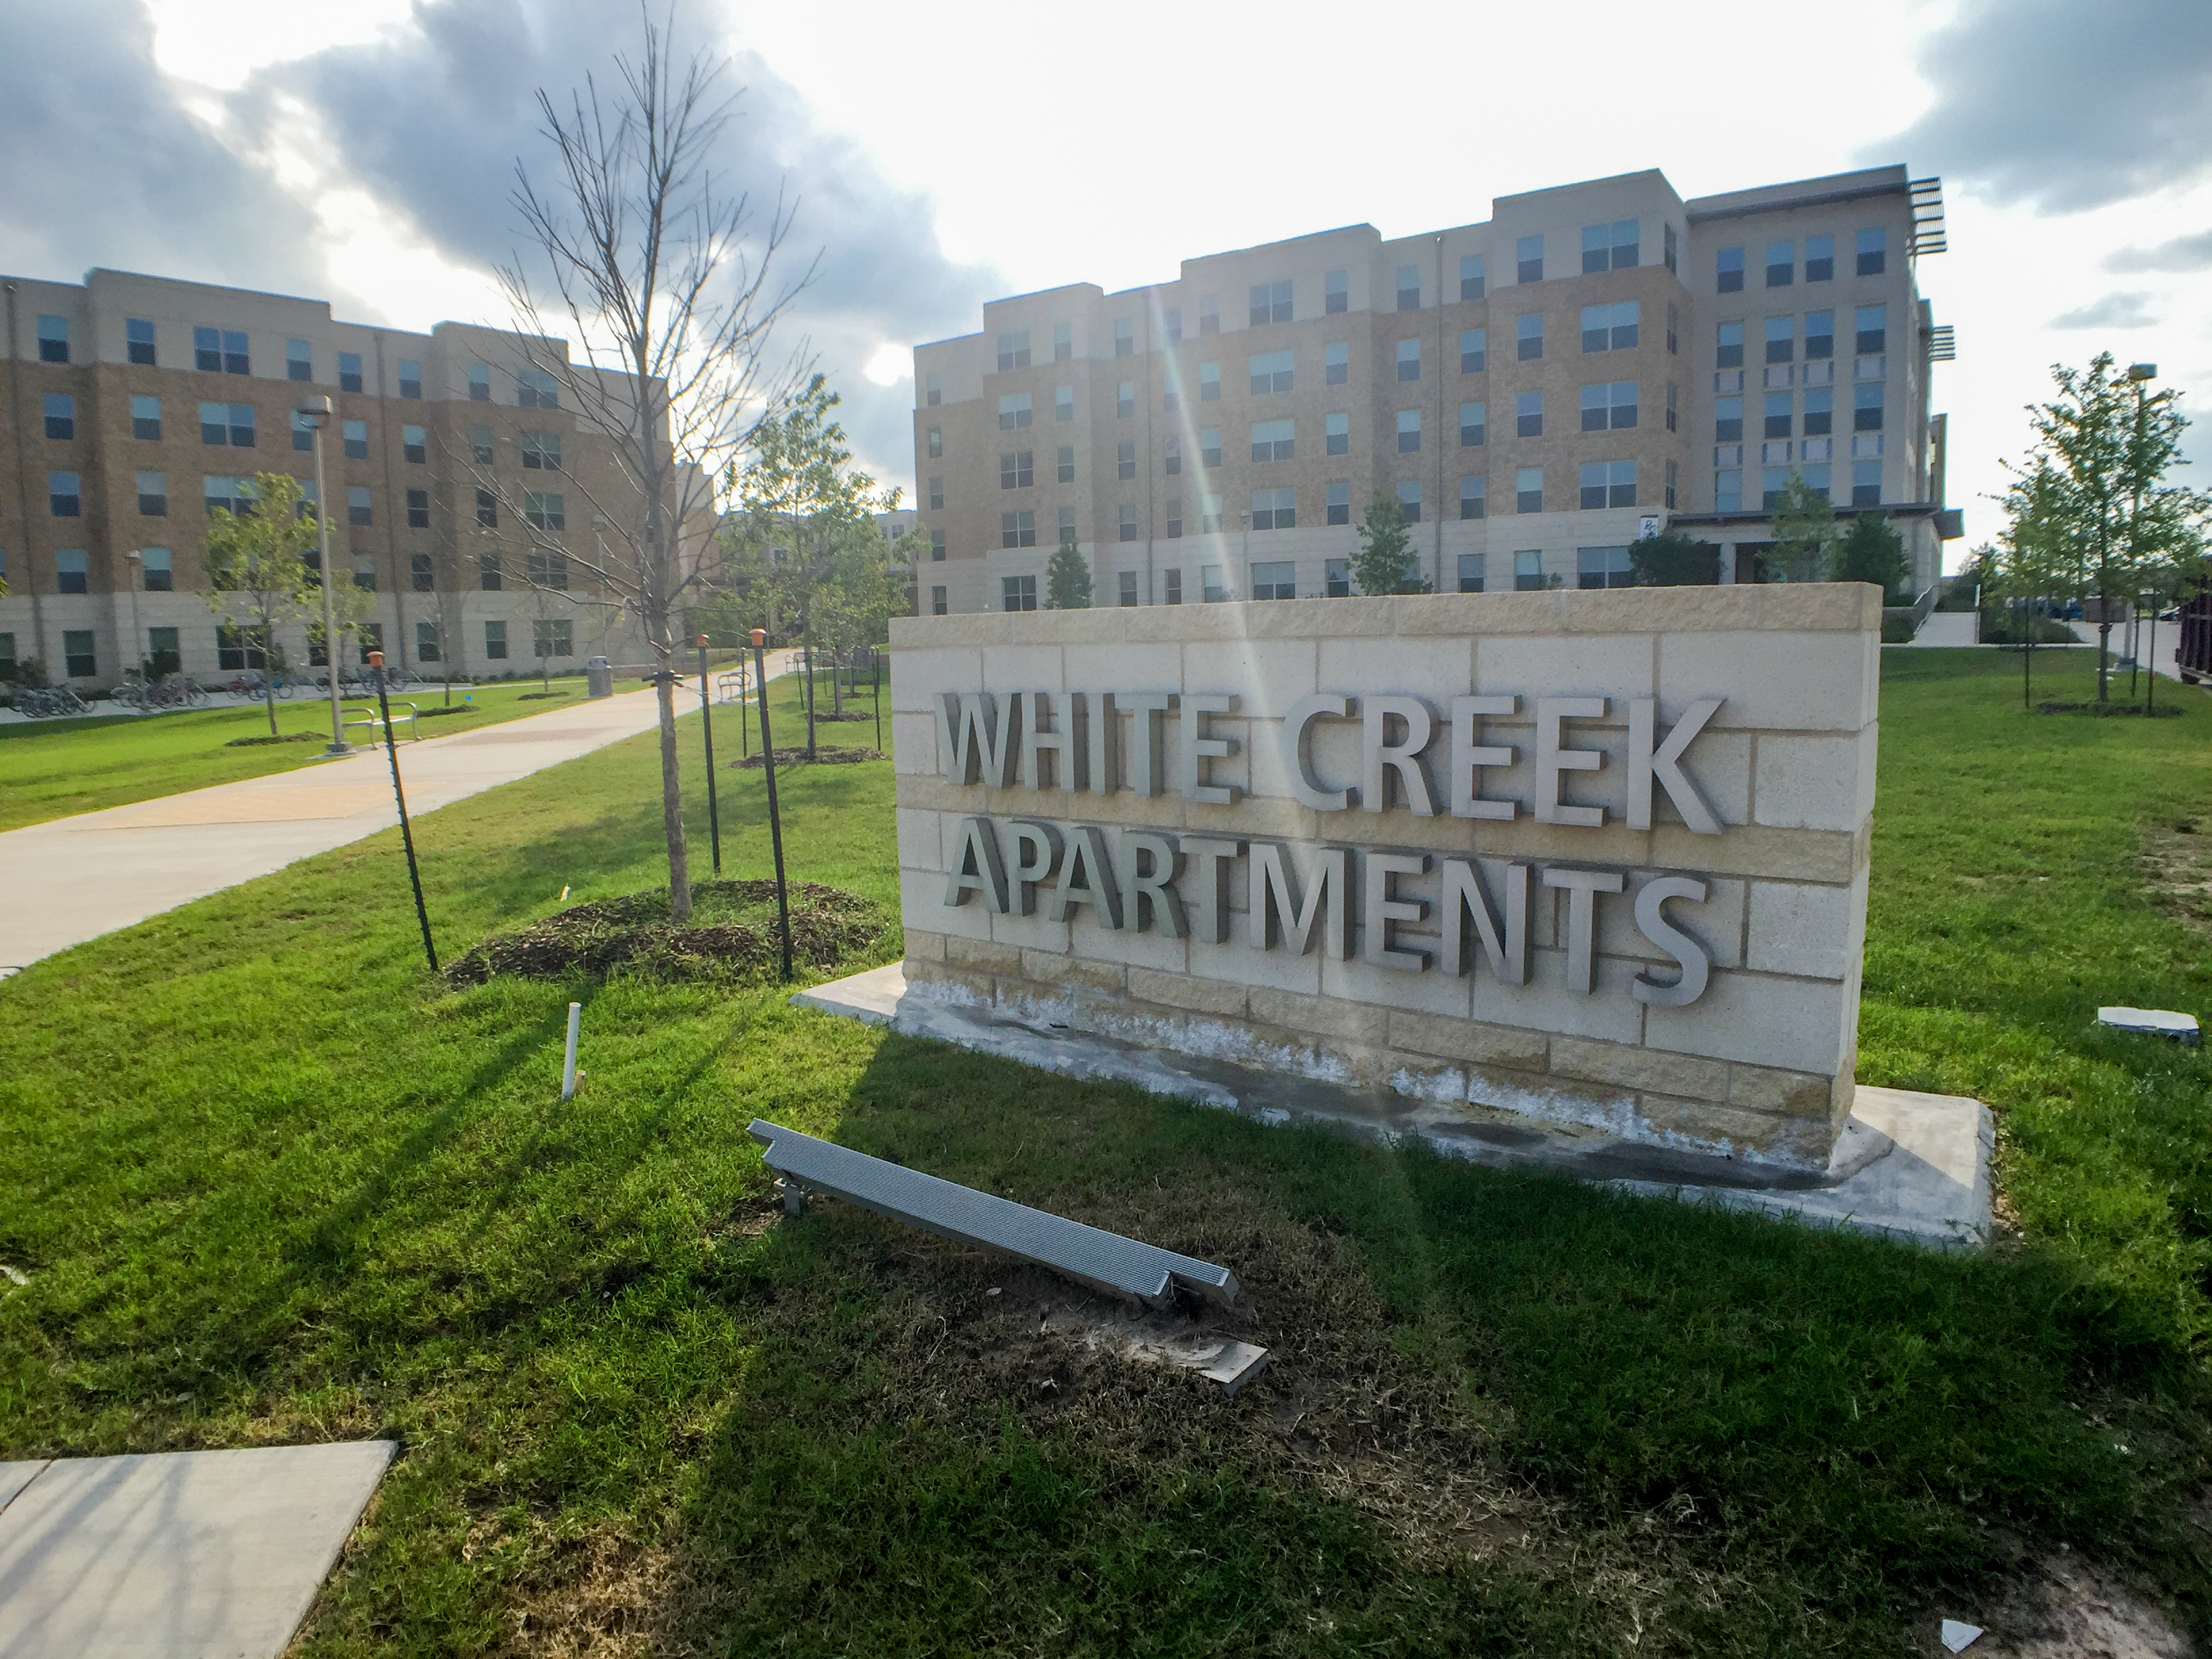 File White Creek Apartments Jpg Wikimedia Commons